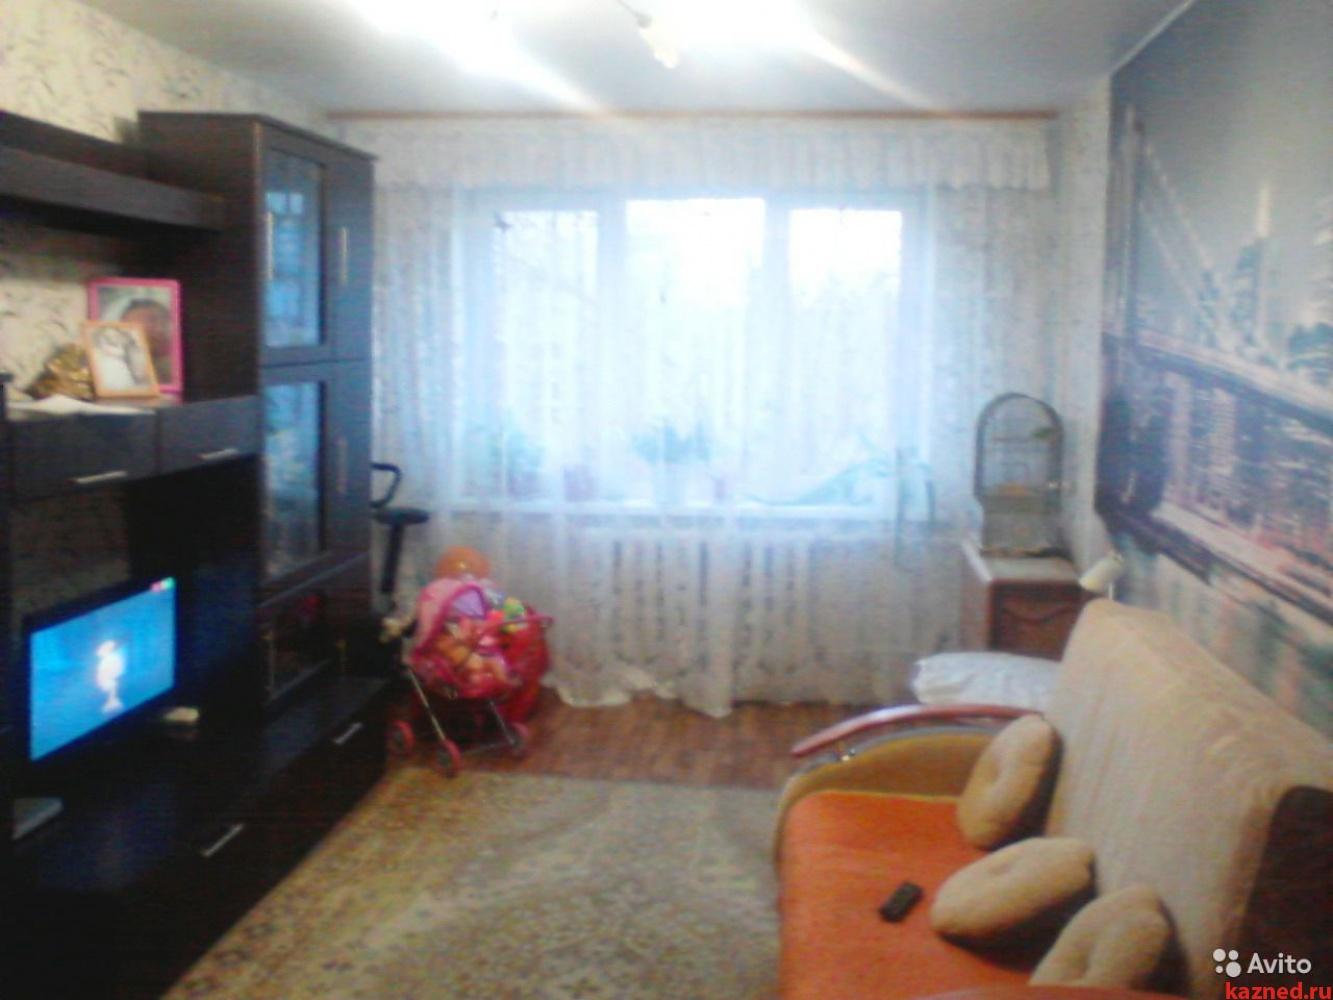 Продажа 3-к квартиры Ямашева 54, 65 м2  (миниатюра №3)